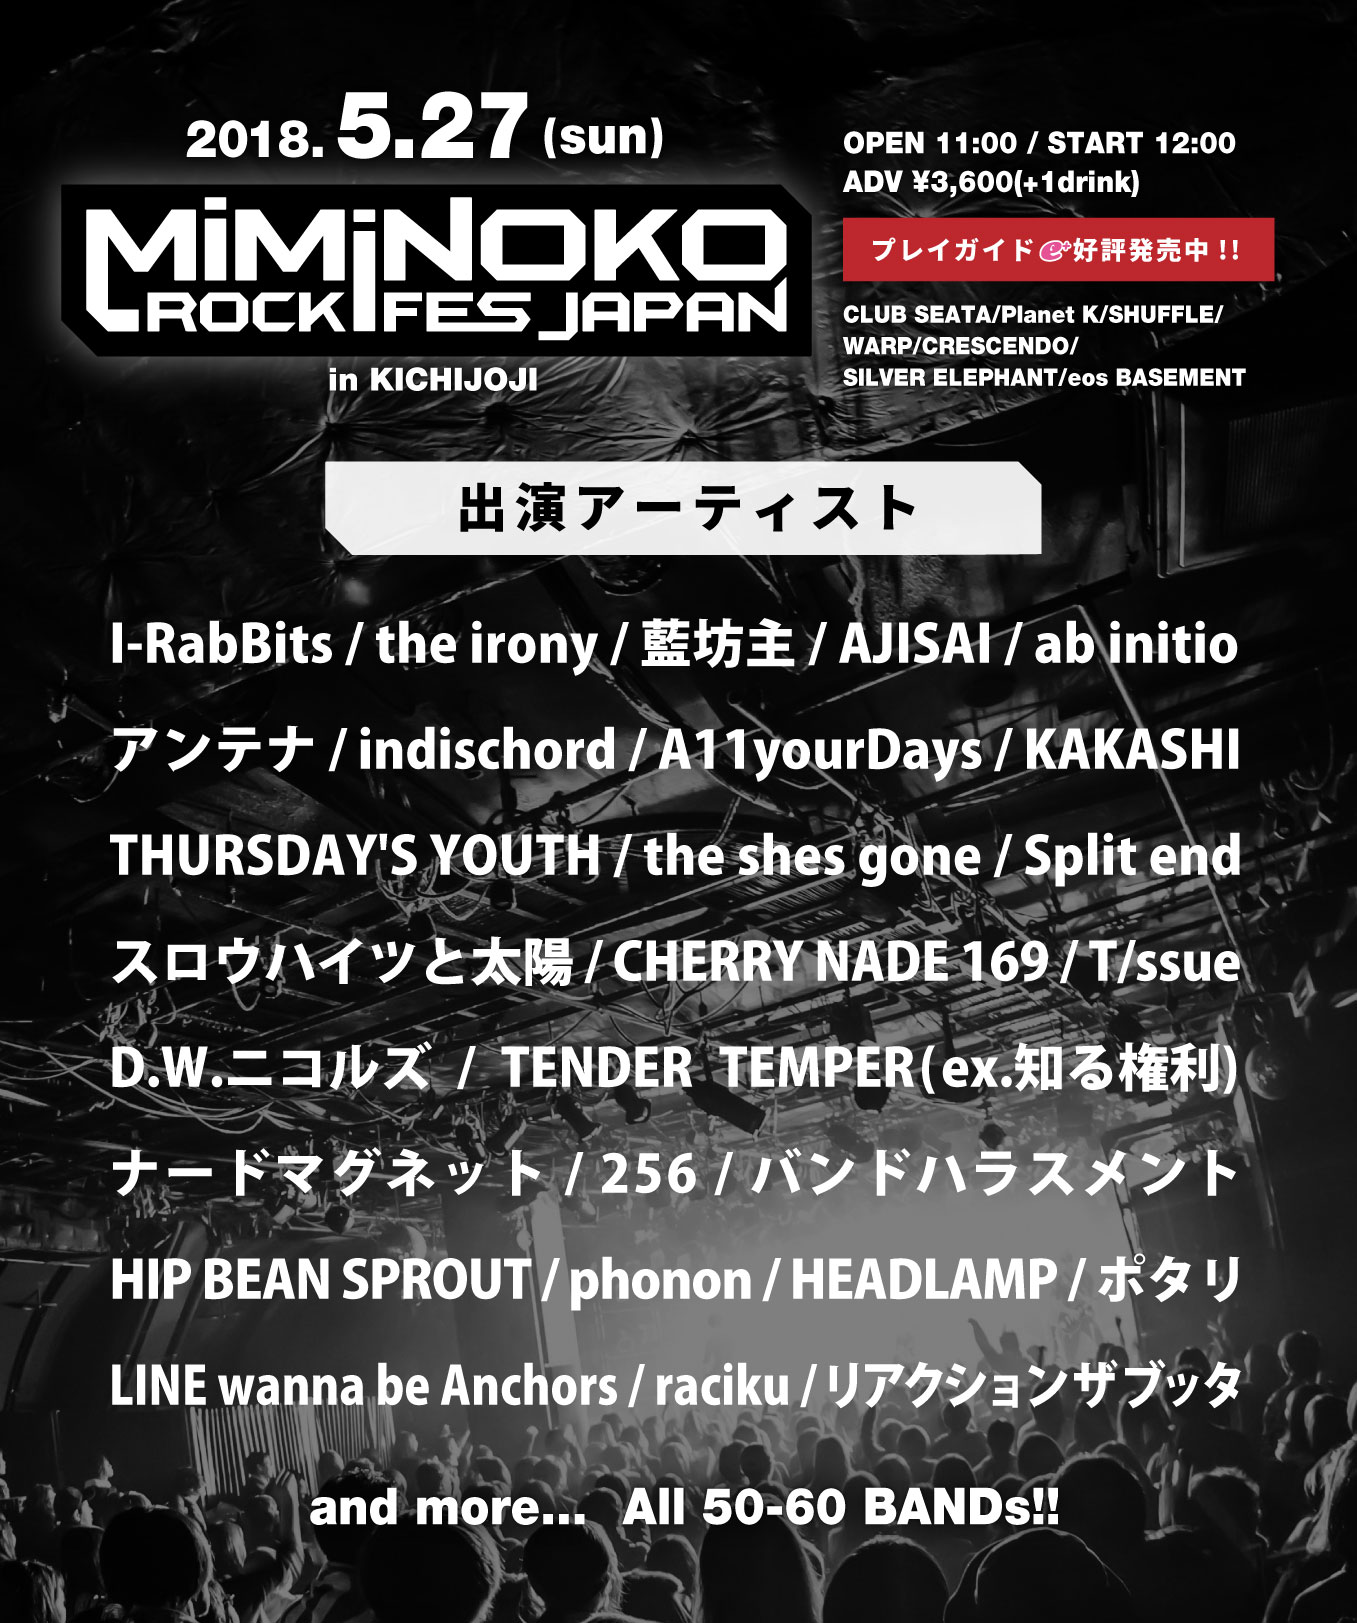 miminoko_kokuchi_一覧_0316_txt